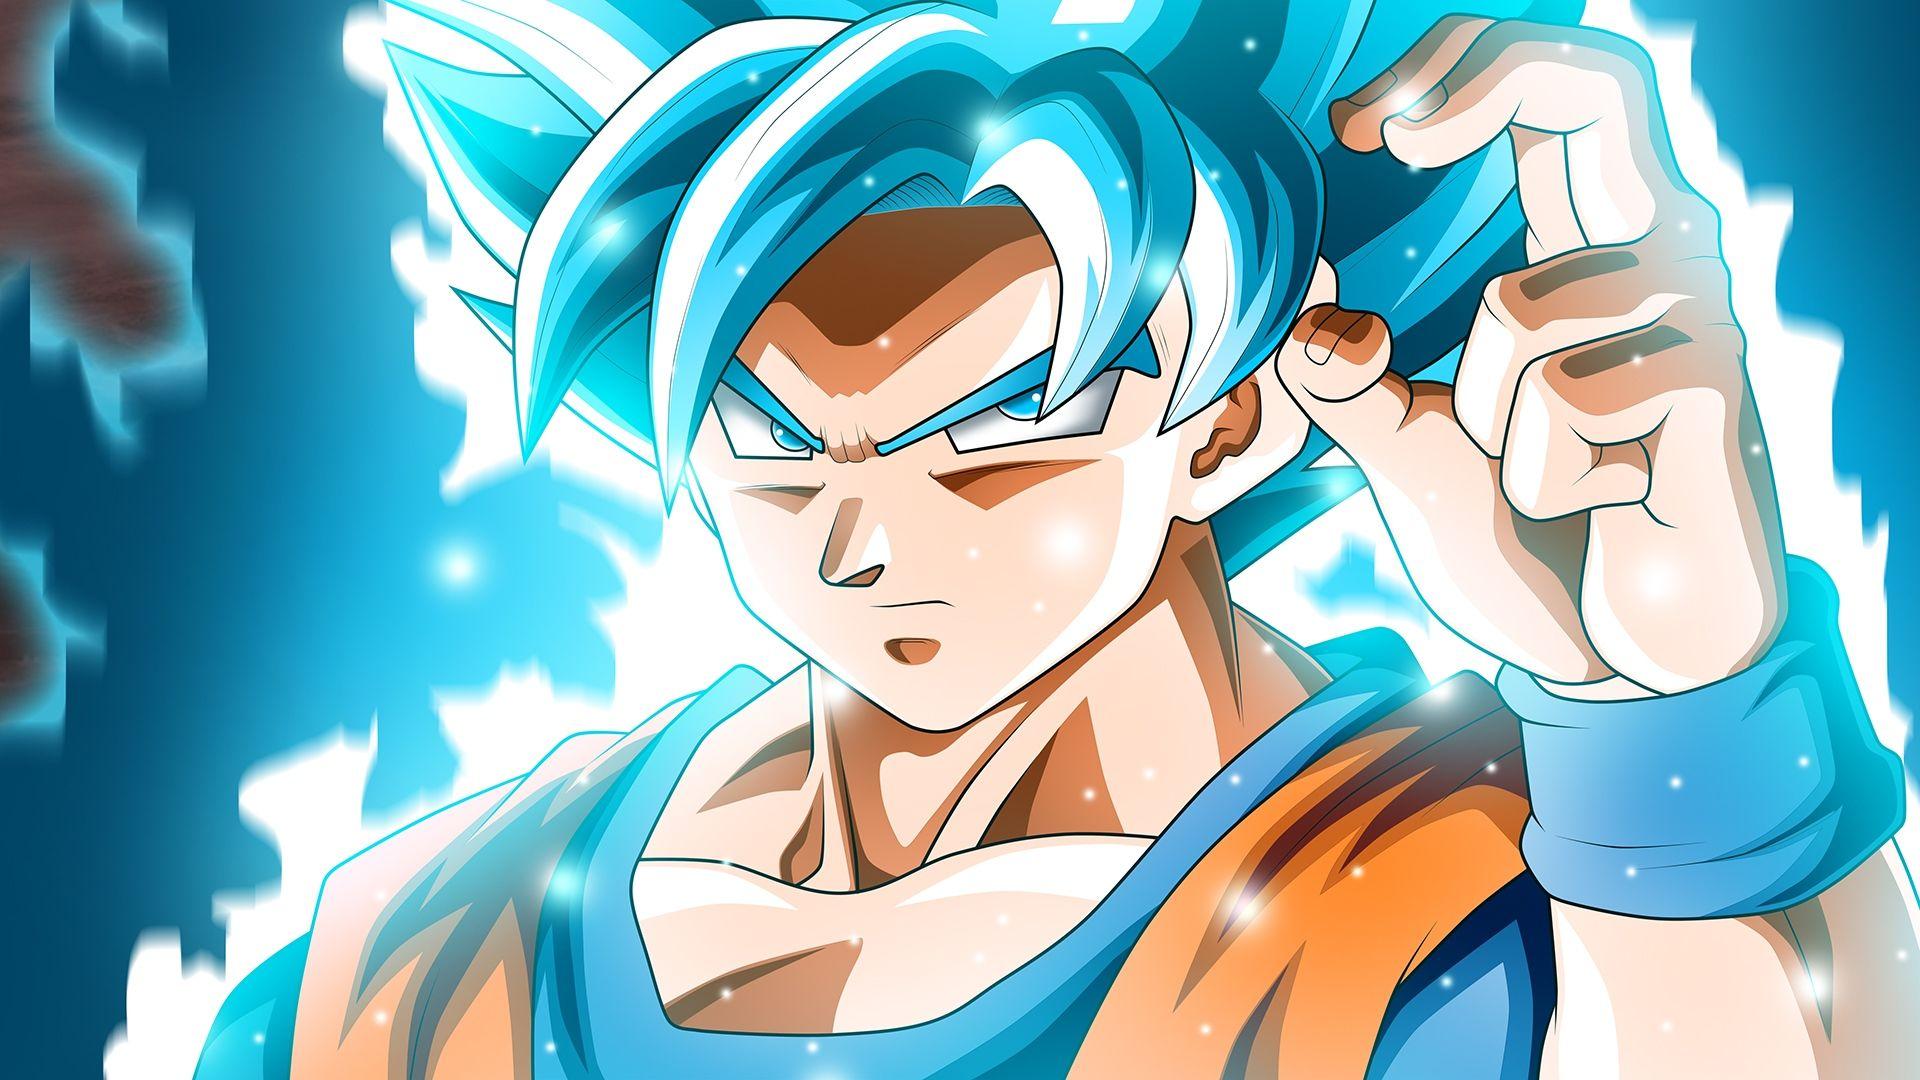 Son Goku Super Saiyan Blue Wallpapers Phone For Wallpaper 1920x1080